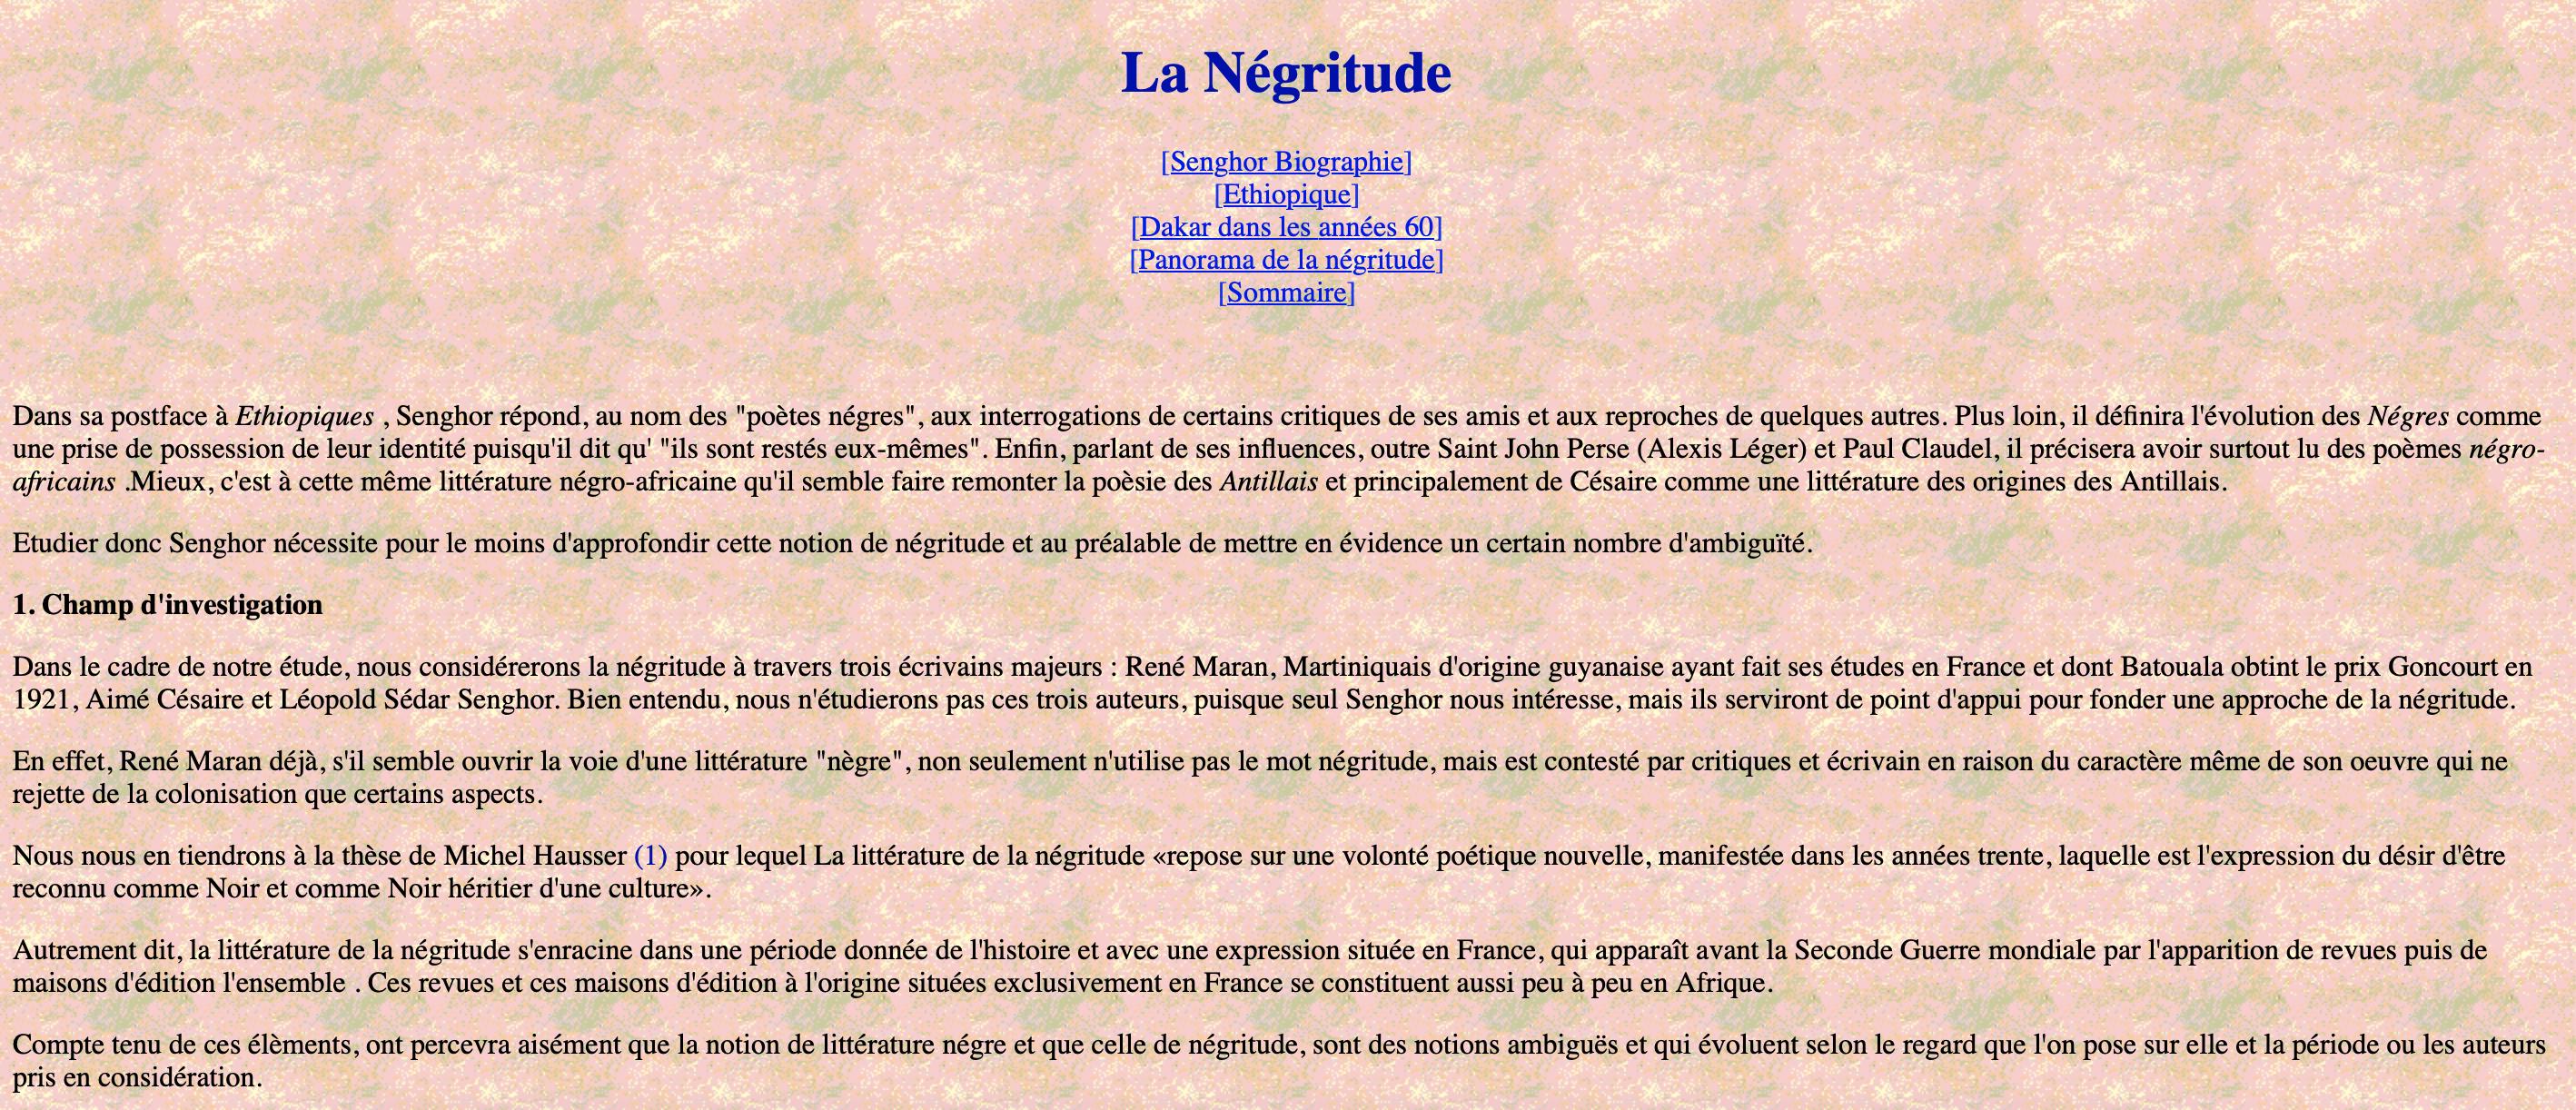 Extrait de Lettres Angevines par Y Jospeh Henri « La Négritude »